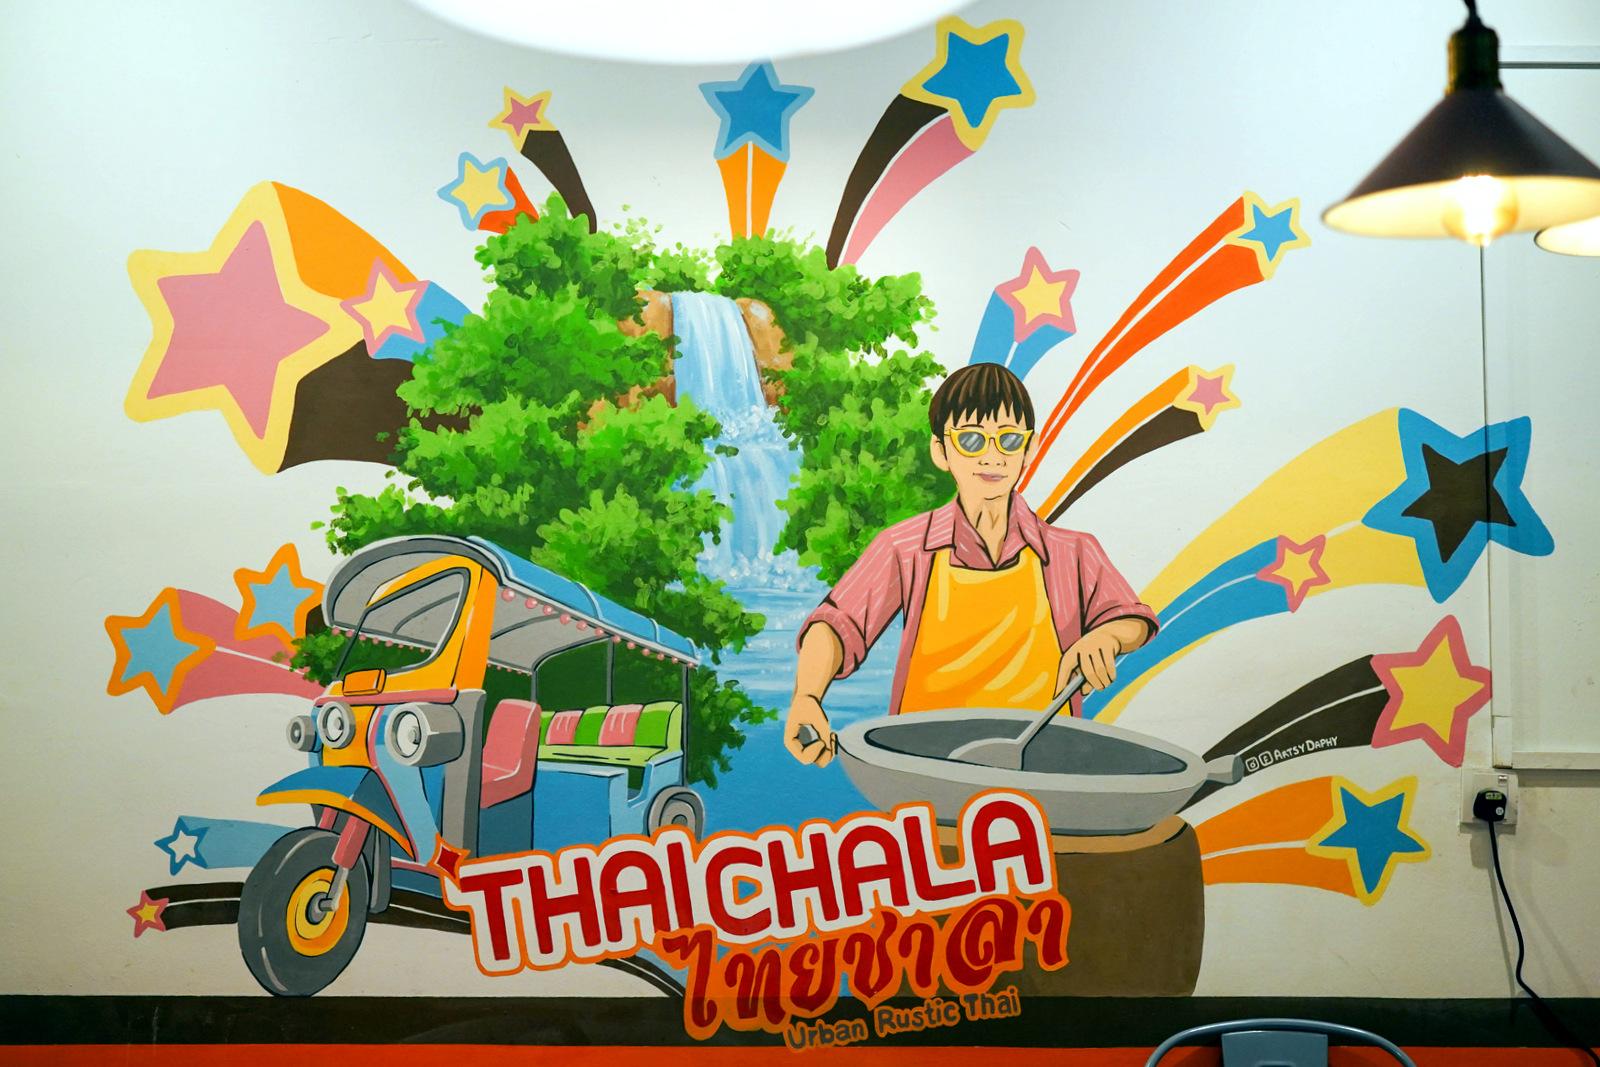 Thai Chala, Sri Petaling